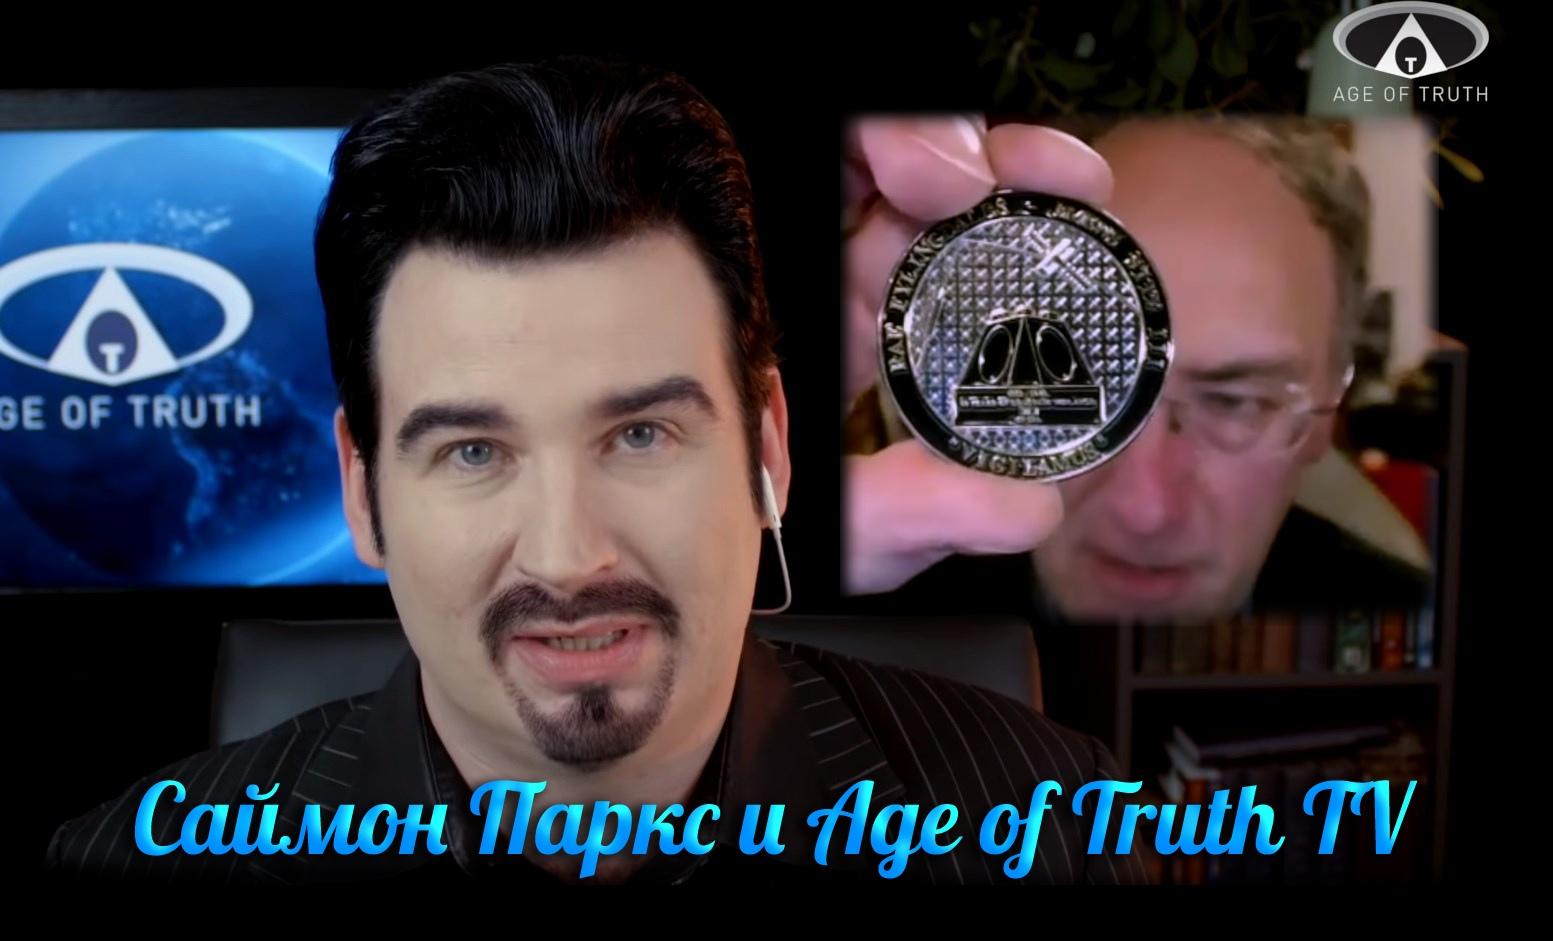 Интервью Саймона Паркса для Age of Truth TV с Лукасом Александром (15 апреля 2019 г.) VelrKmom9sg